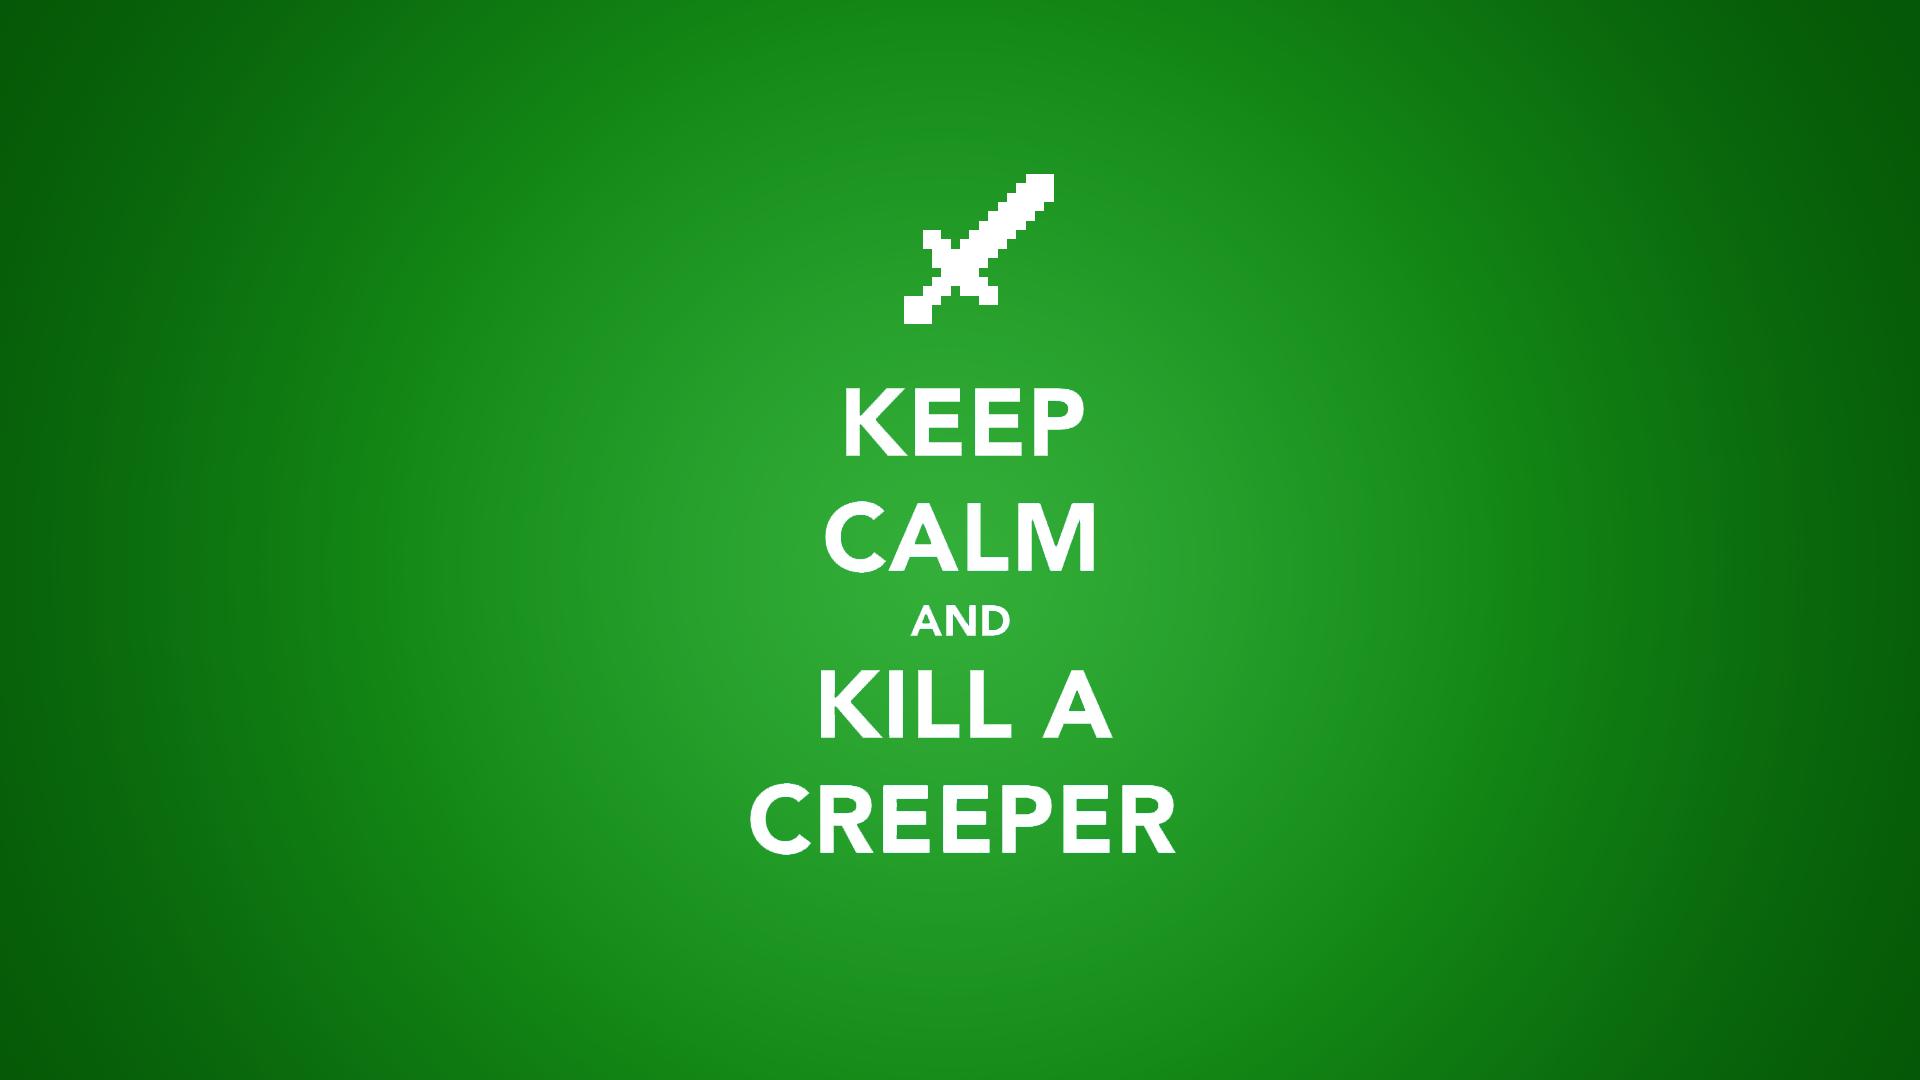 Minecraft Quote Wallpaper Creeper #724   Hdwidescreens.